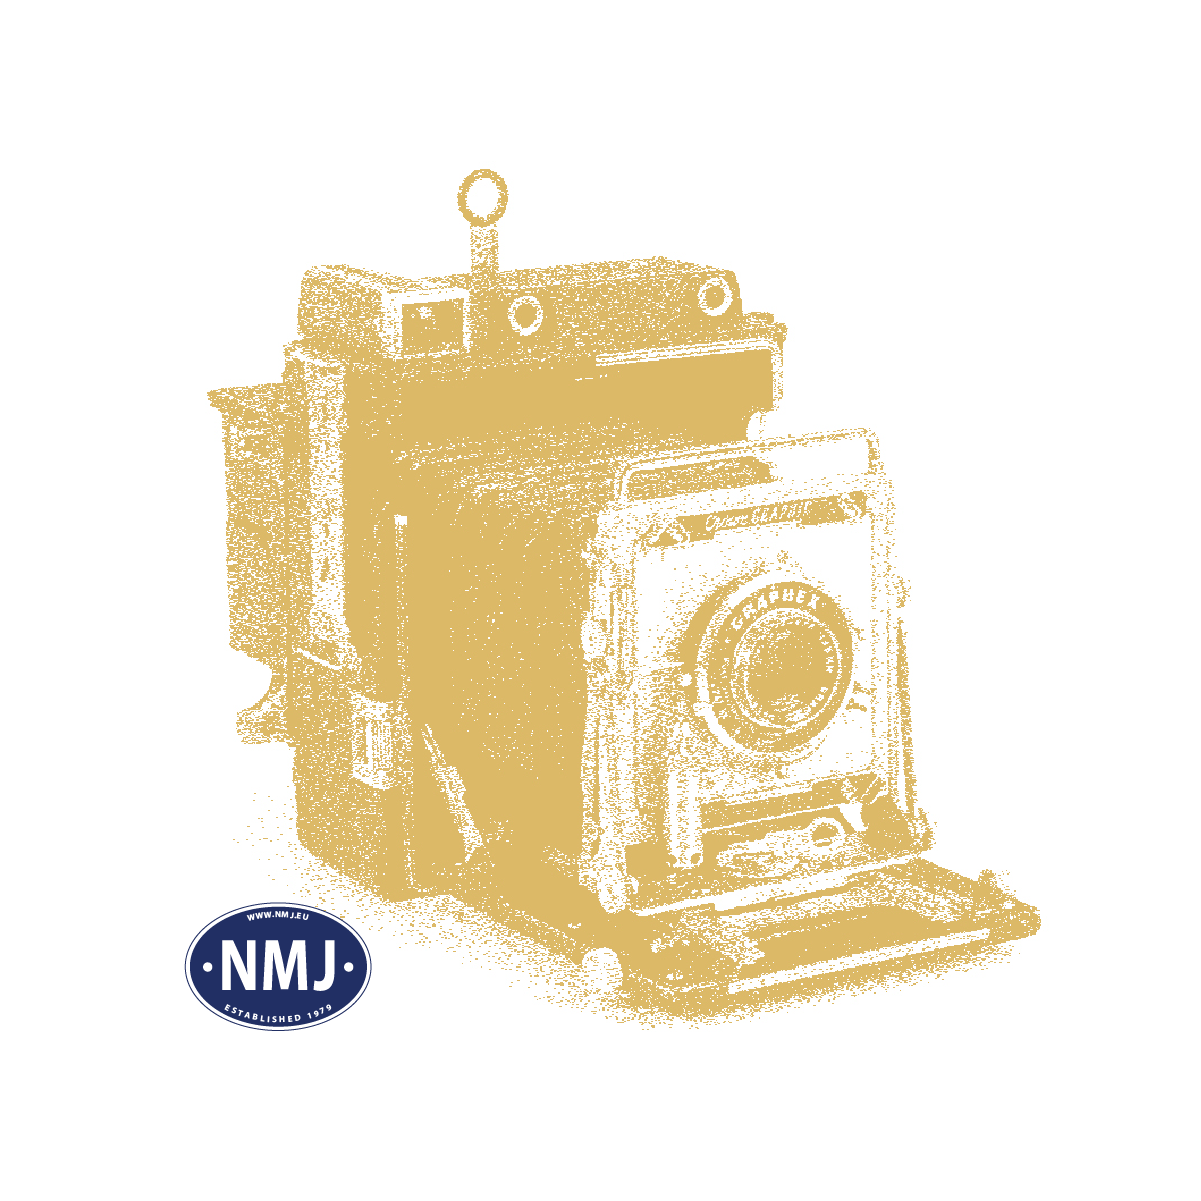 "NMJT90212 - NMJ Topline MAV M61 019 ""Classic"", DCC m/ Lyd"